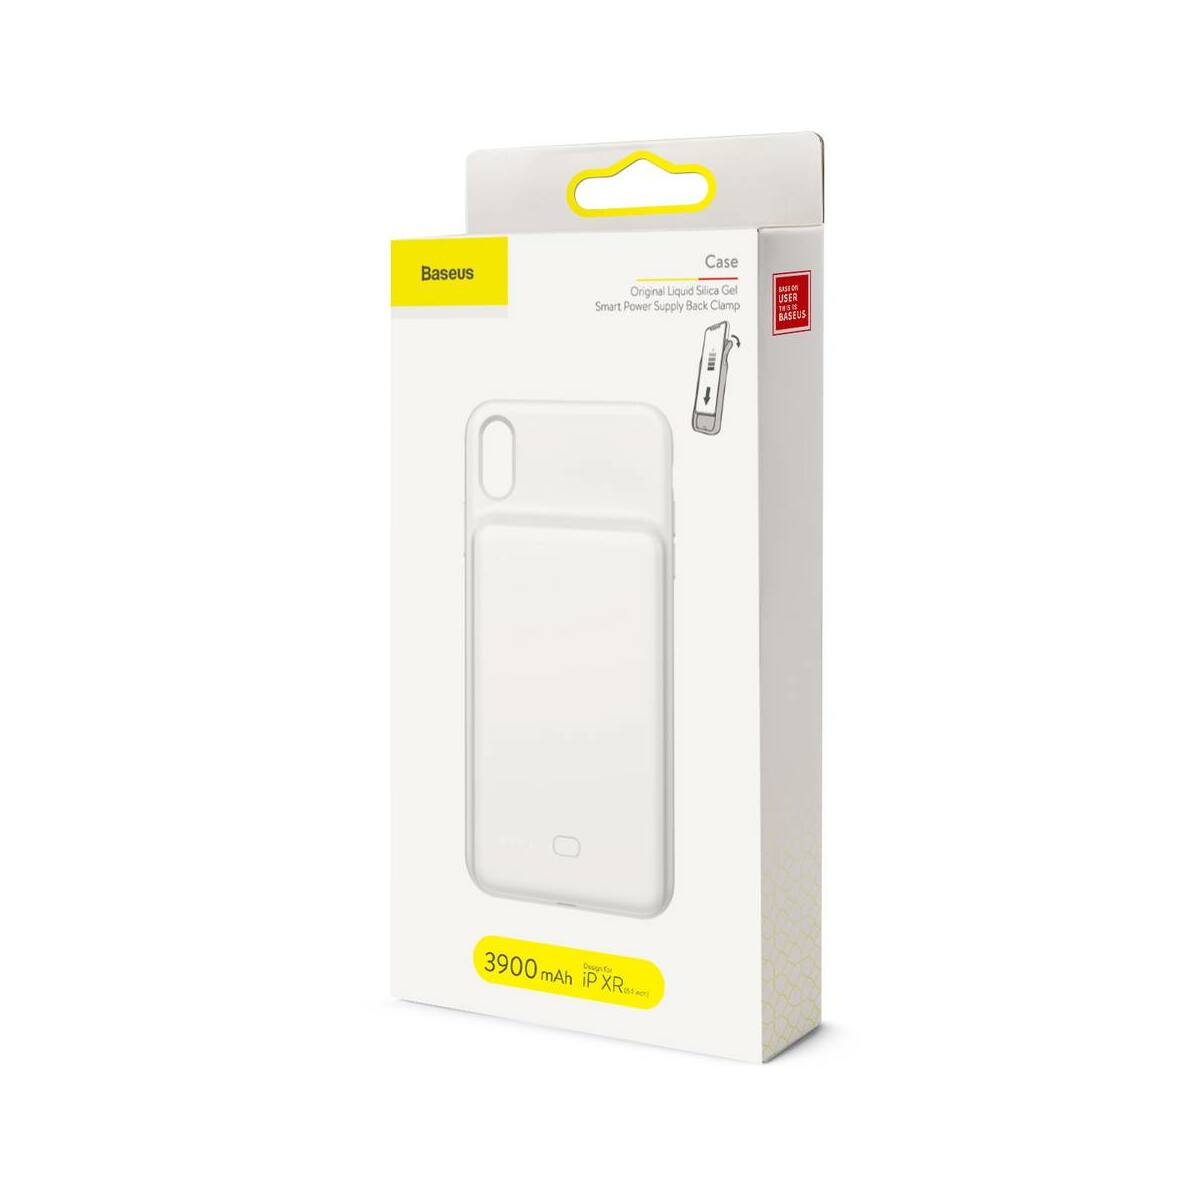 Baseus Power Bank tok, Liquid Silicone Smart back clamp 3900 mAh, XR, fehér (ACAPIPH61-BJ02)